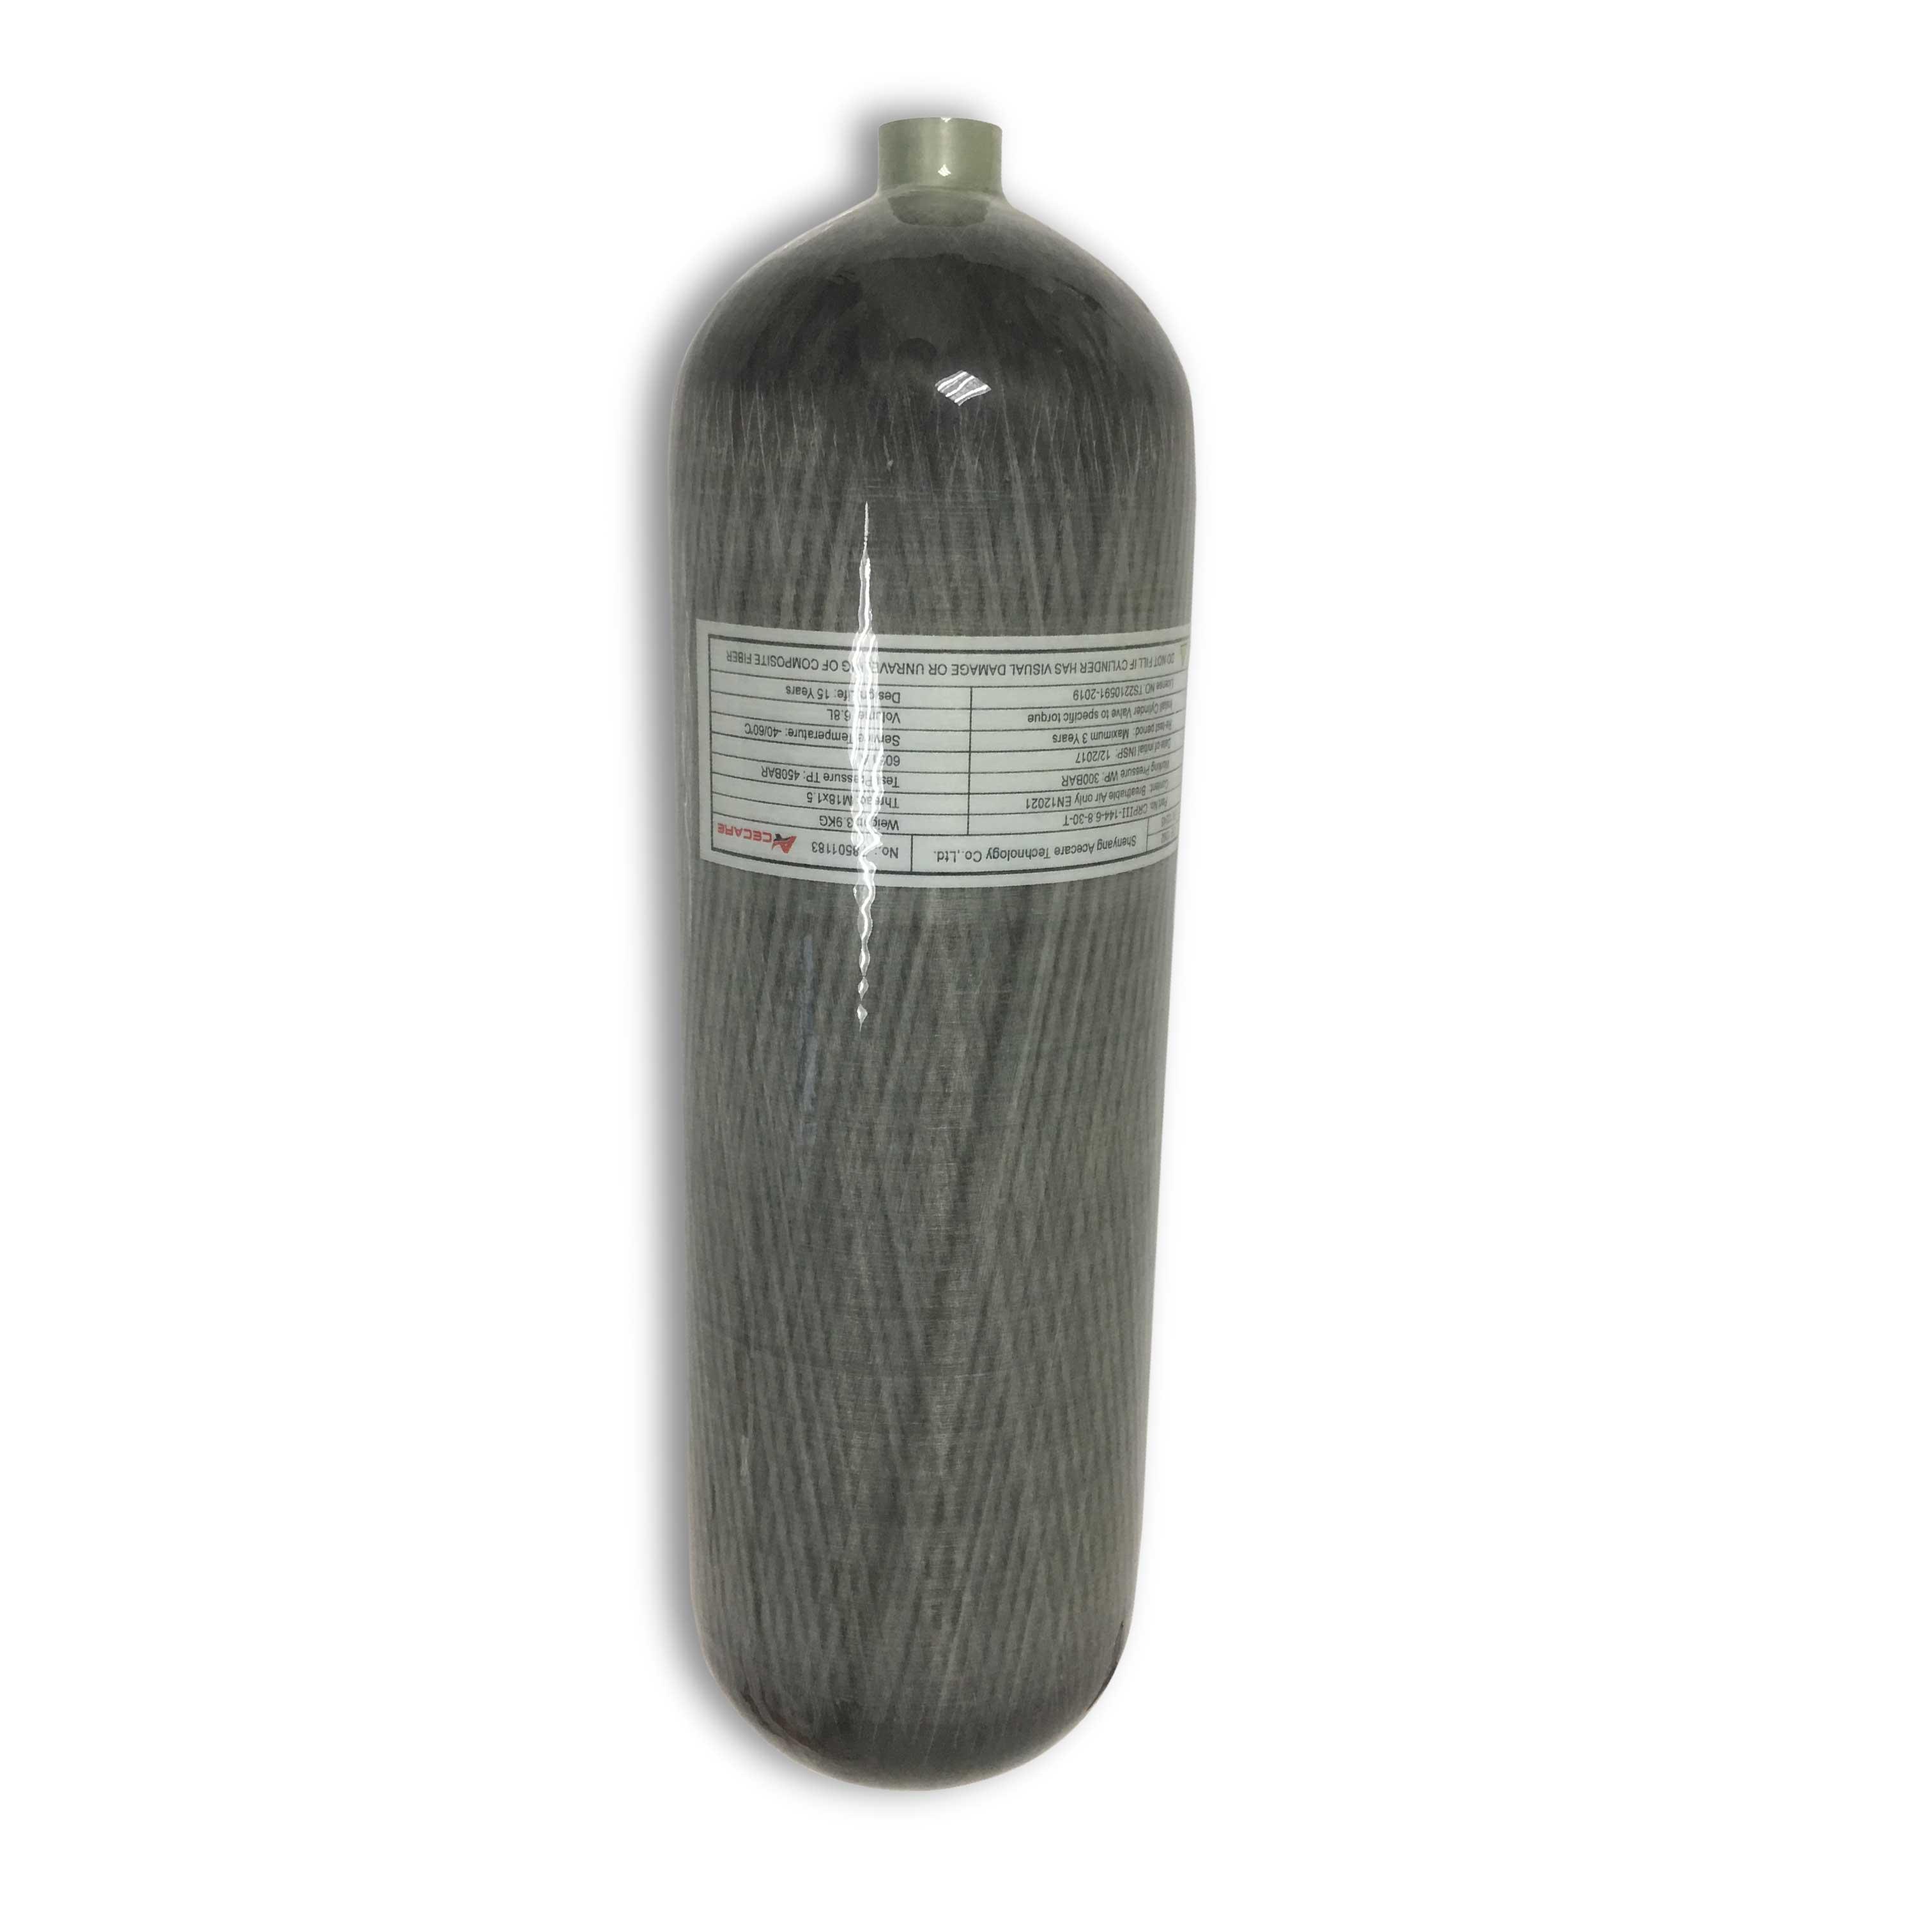 AC168 High Pressure Oxygen Tank/SCBA Diving Bottles/Paintball Tank/4500psi 300bar 6.8L Composite Carbon Fiber Cylinder Acecare